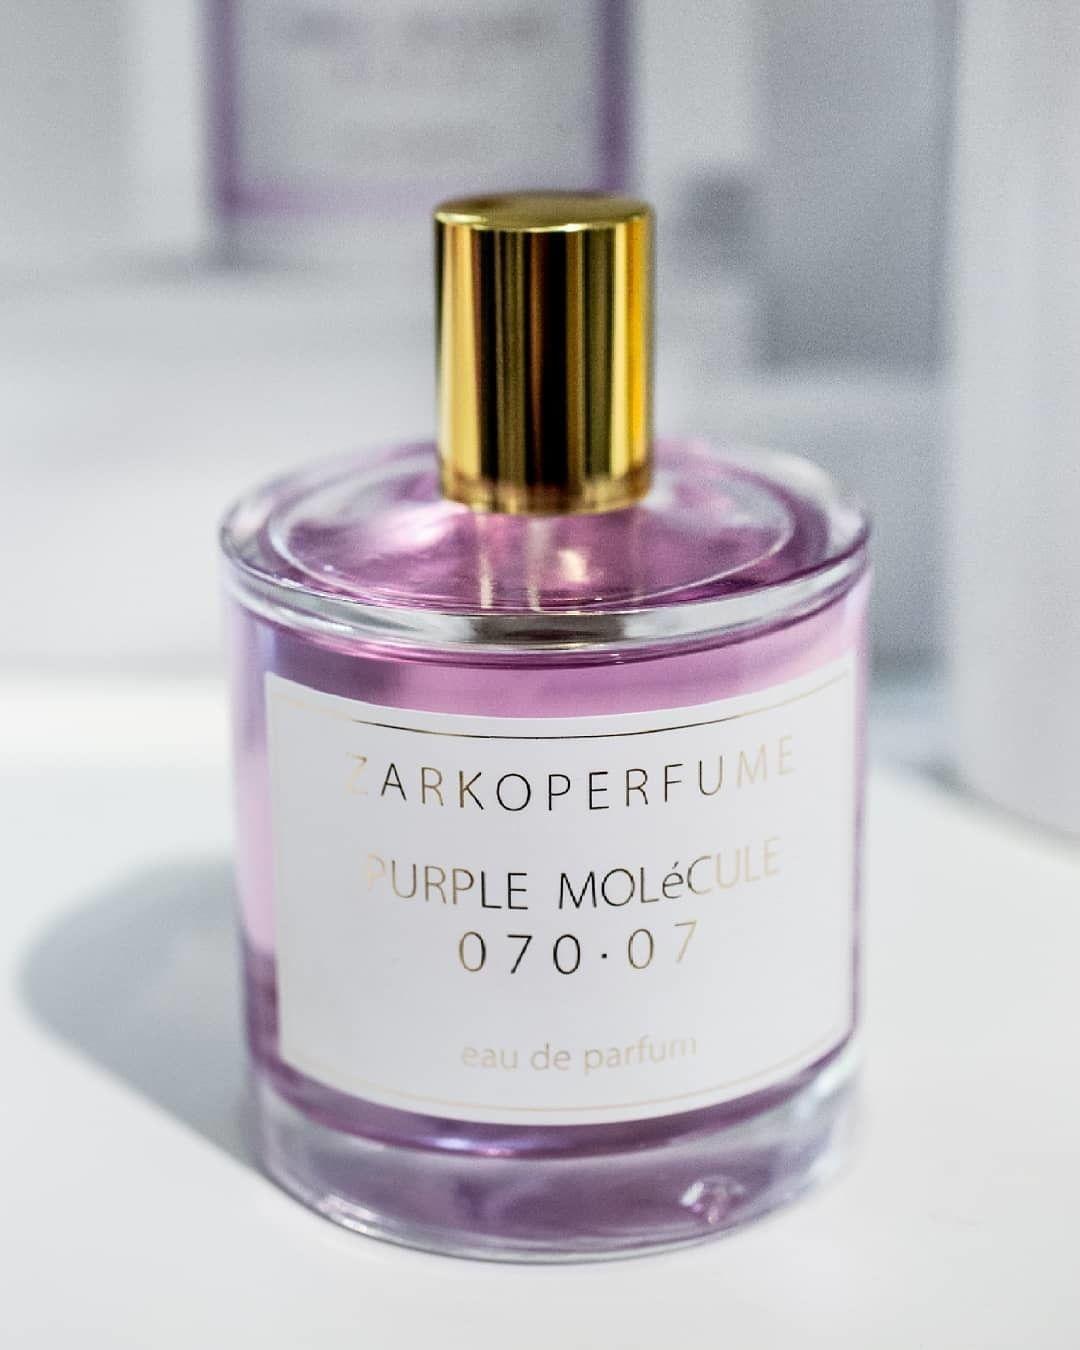 Kết quả hình ảnh cho ZarkoPerfume purple molecule 070-07 edp